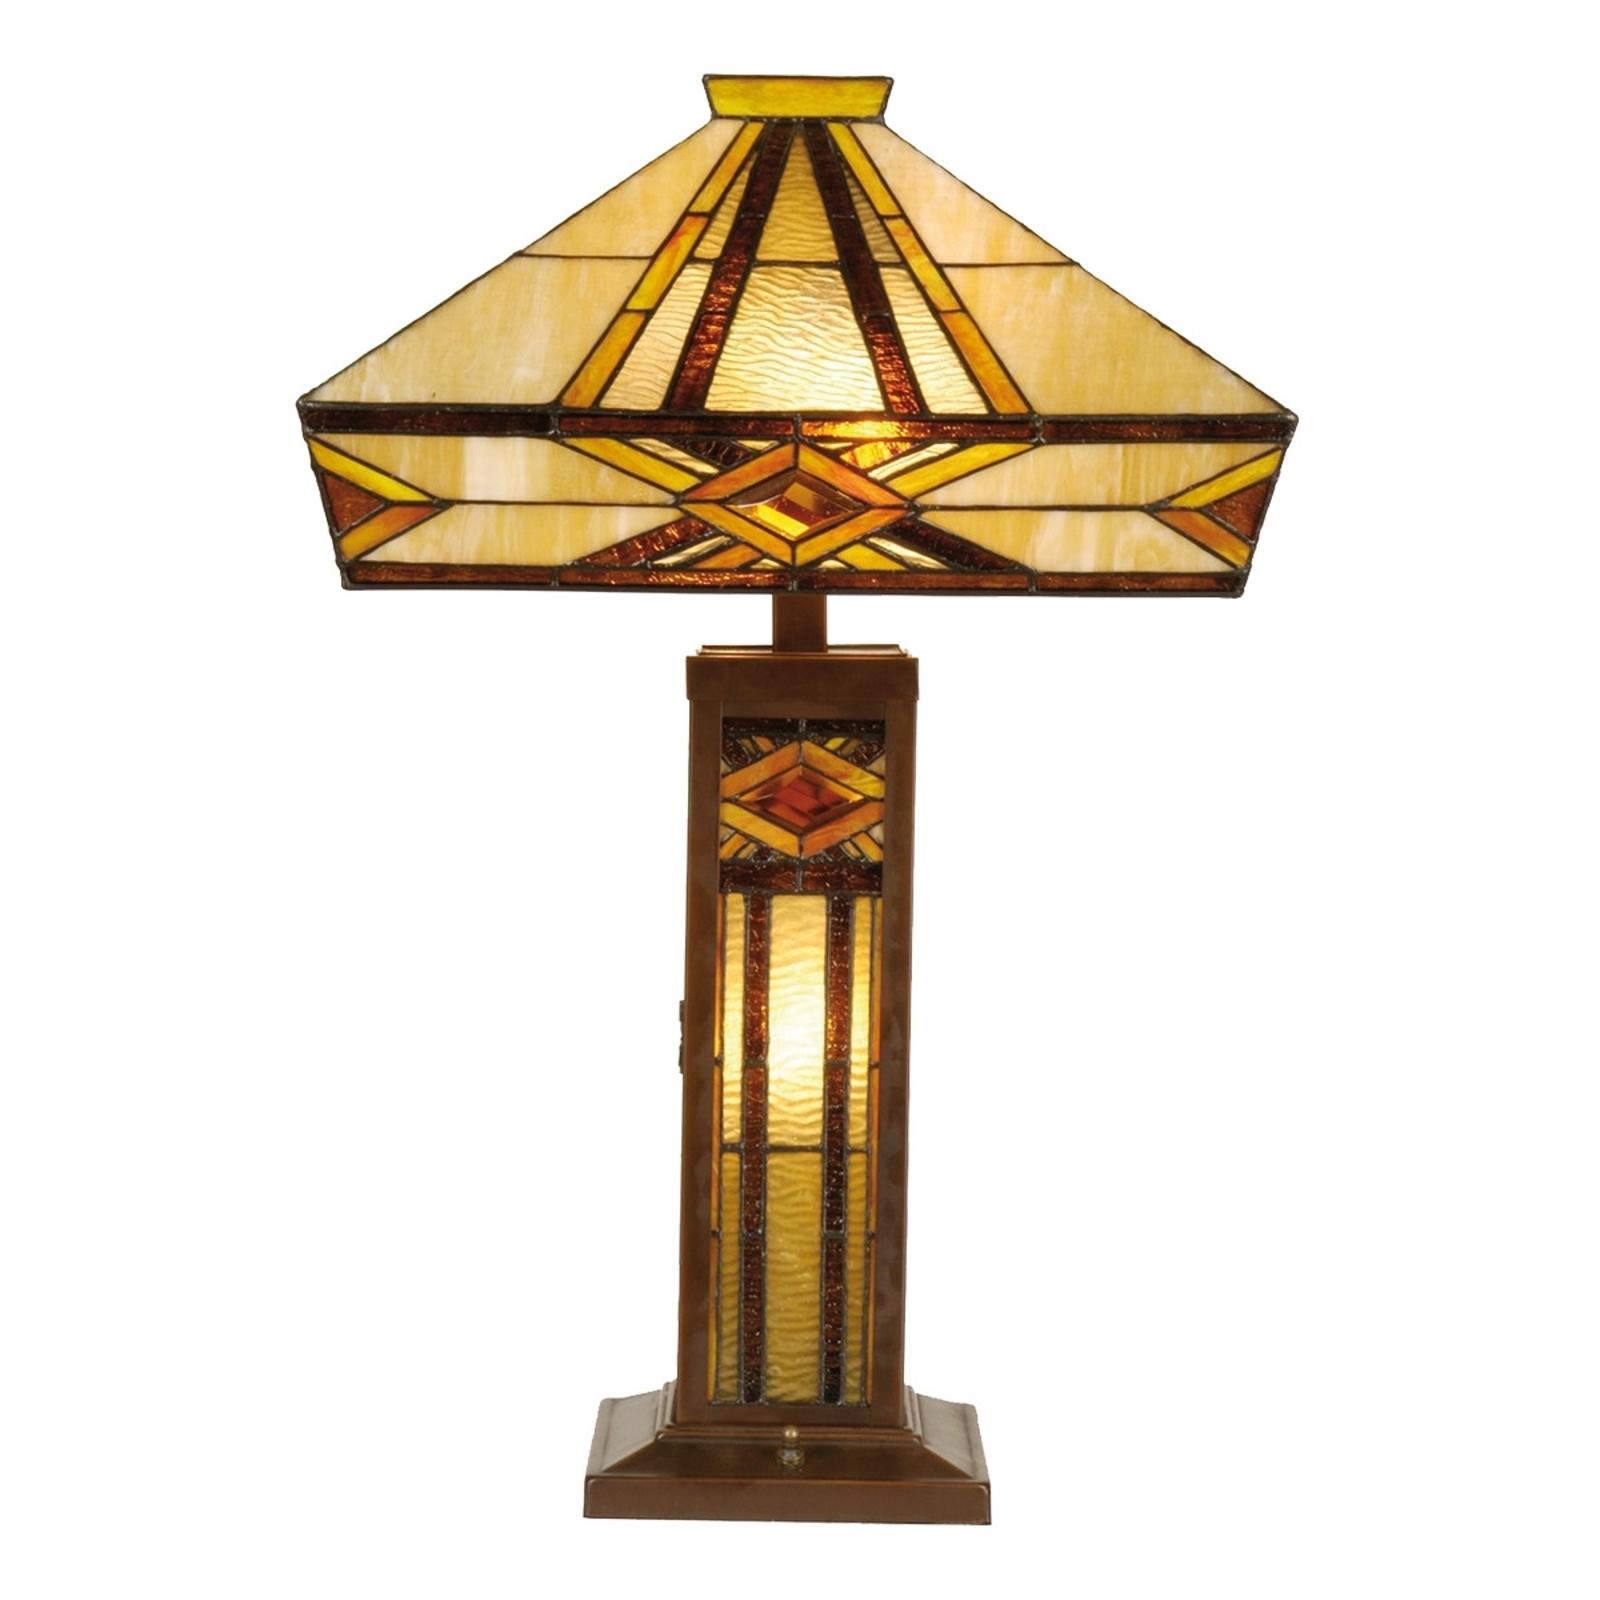 Hell erleuchtete Tischleuchte Glenys, Tiffany-Stil